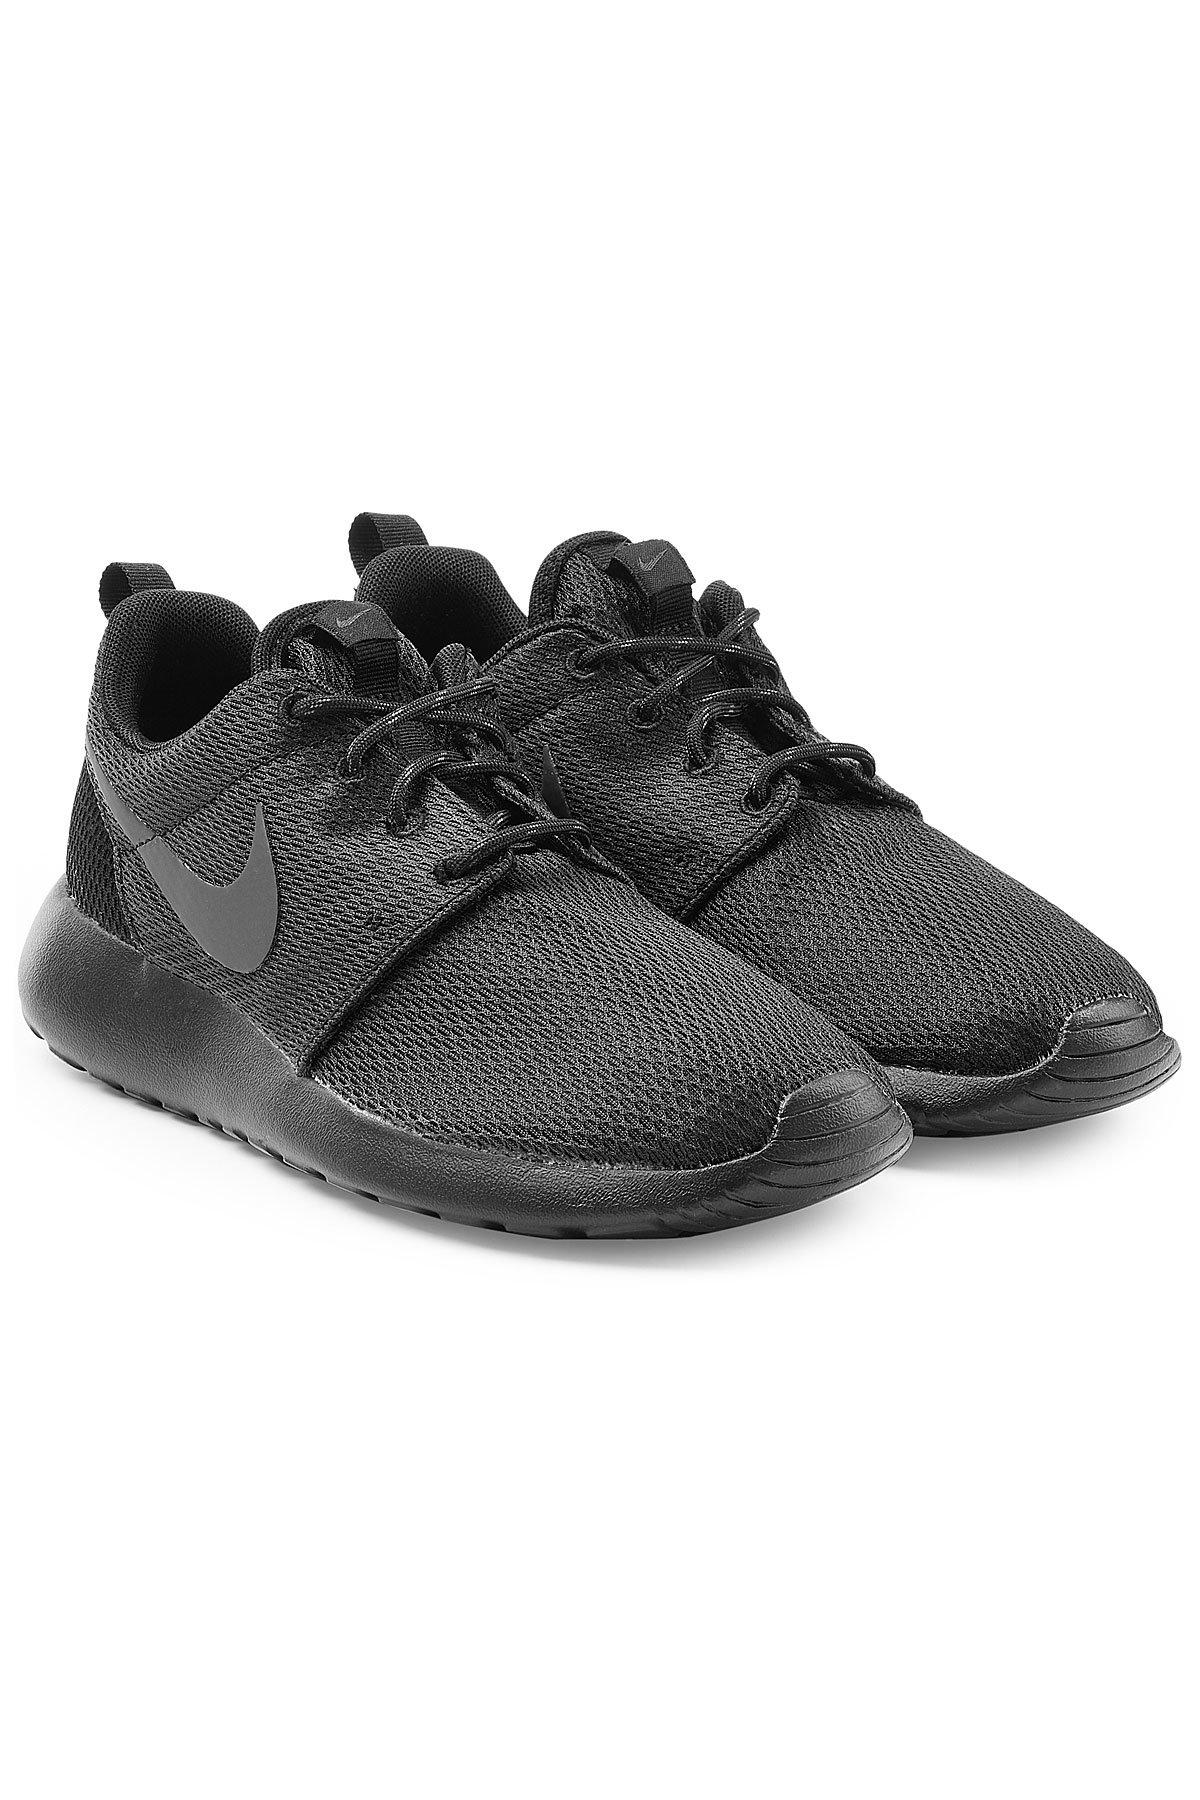 Roshe One Sneakers - Nike   WOMEN   GB STYLEBOP.COM